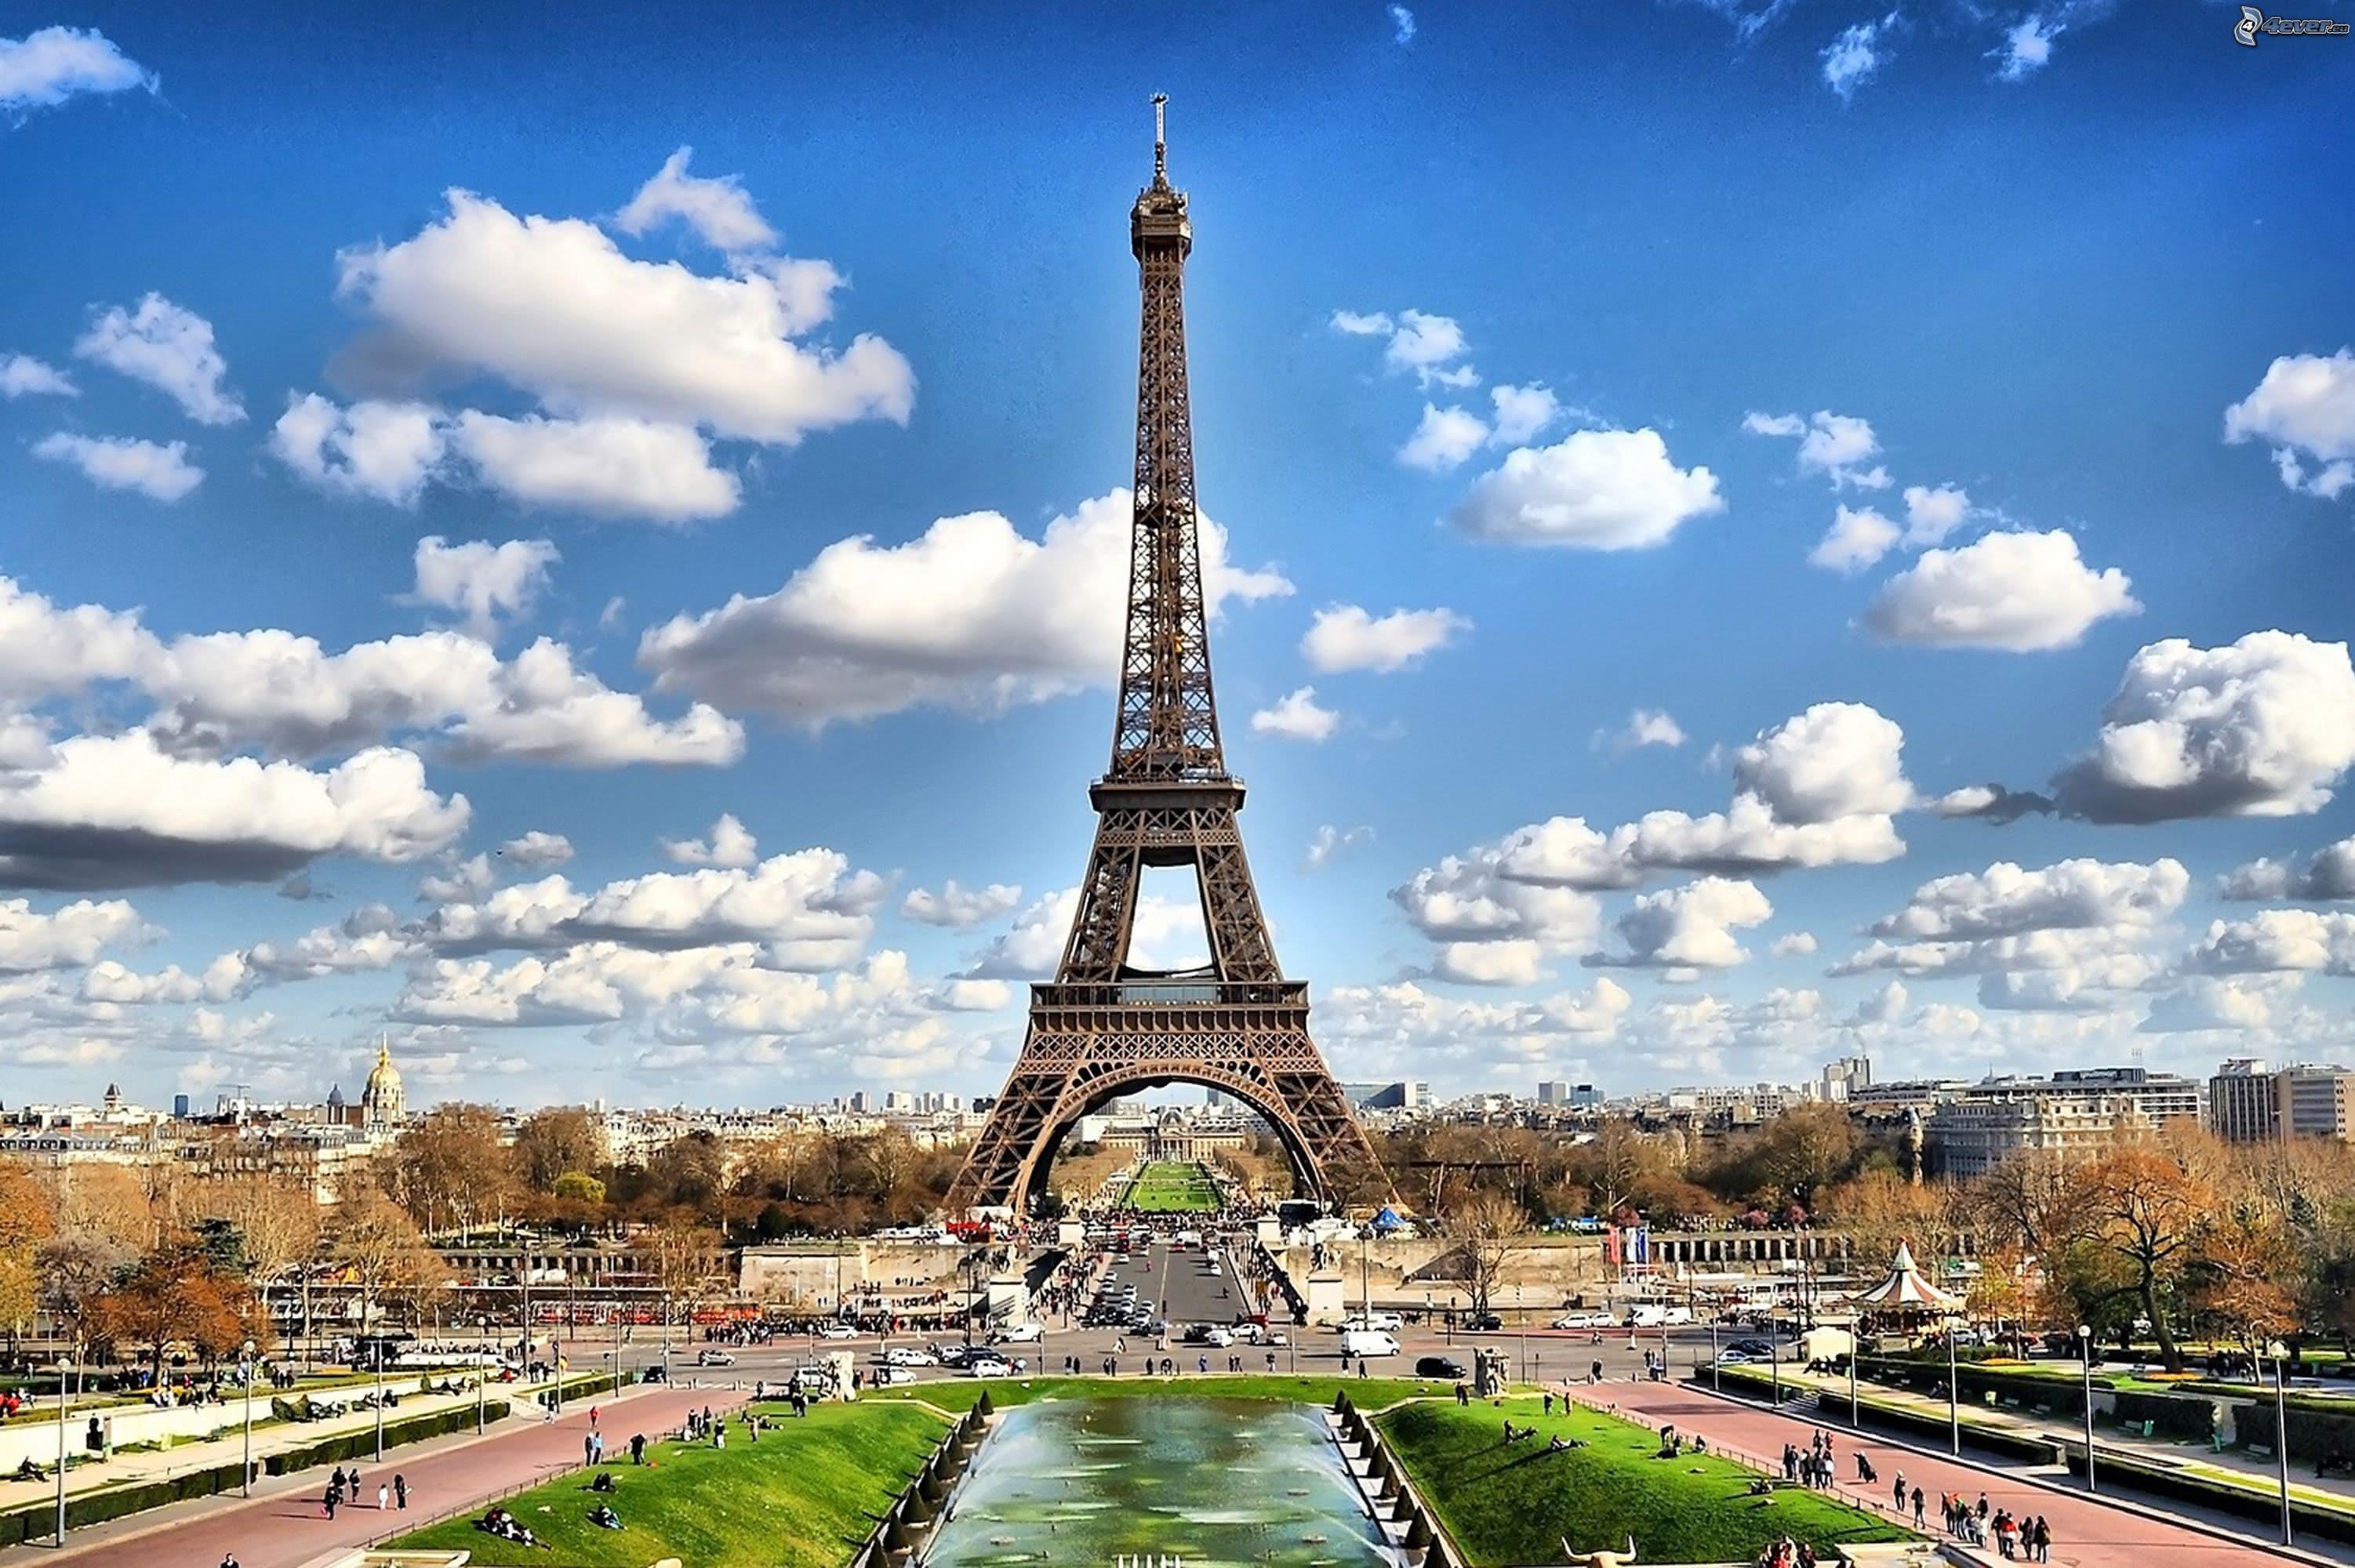 Herzlich Willkommen in Paris am Gare de Lyon